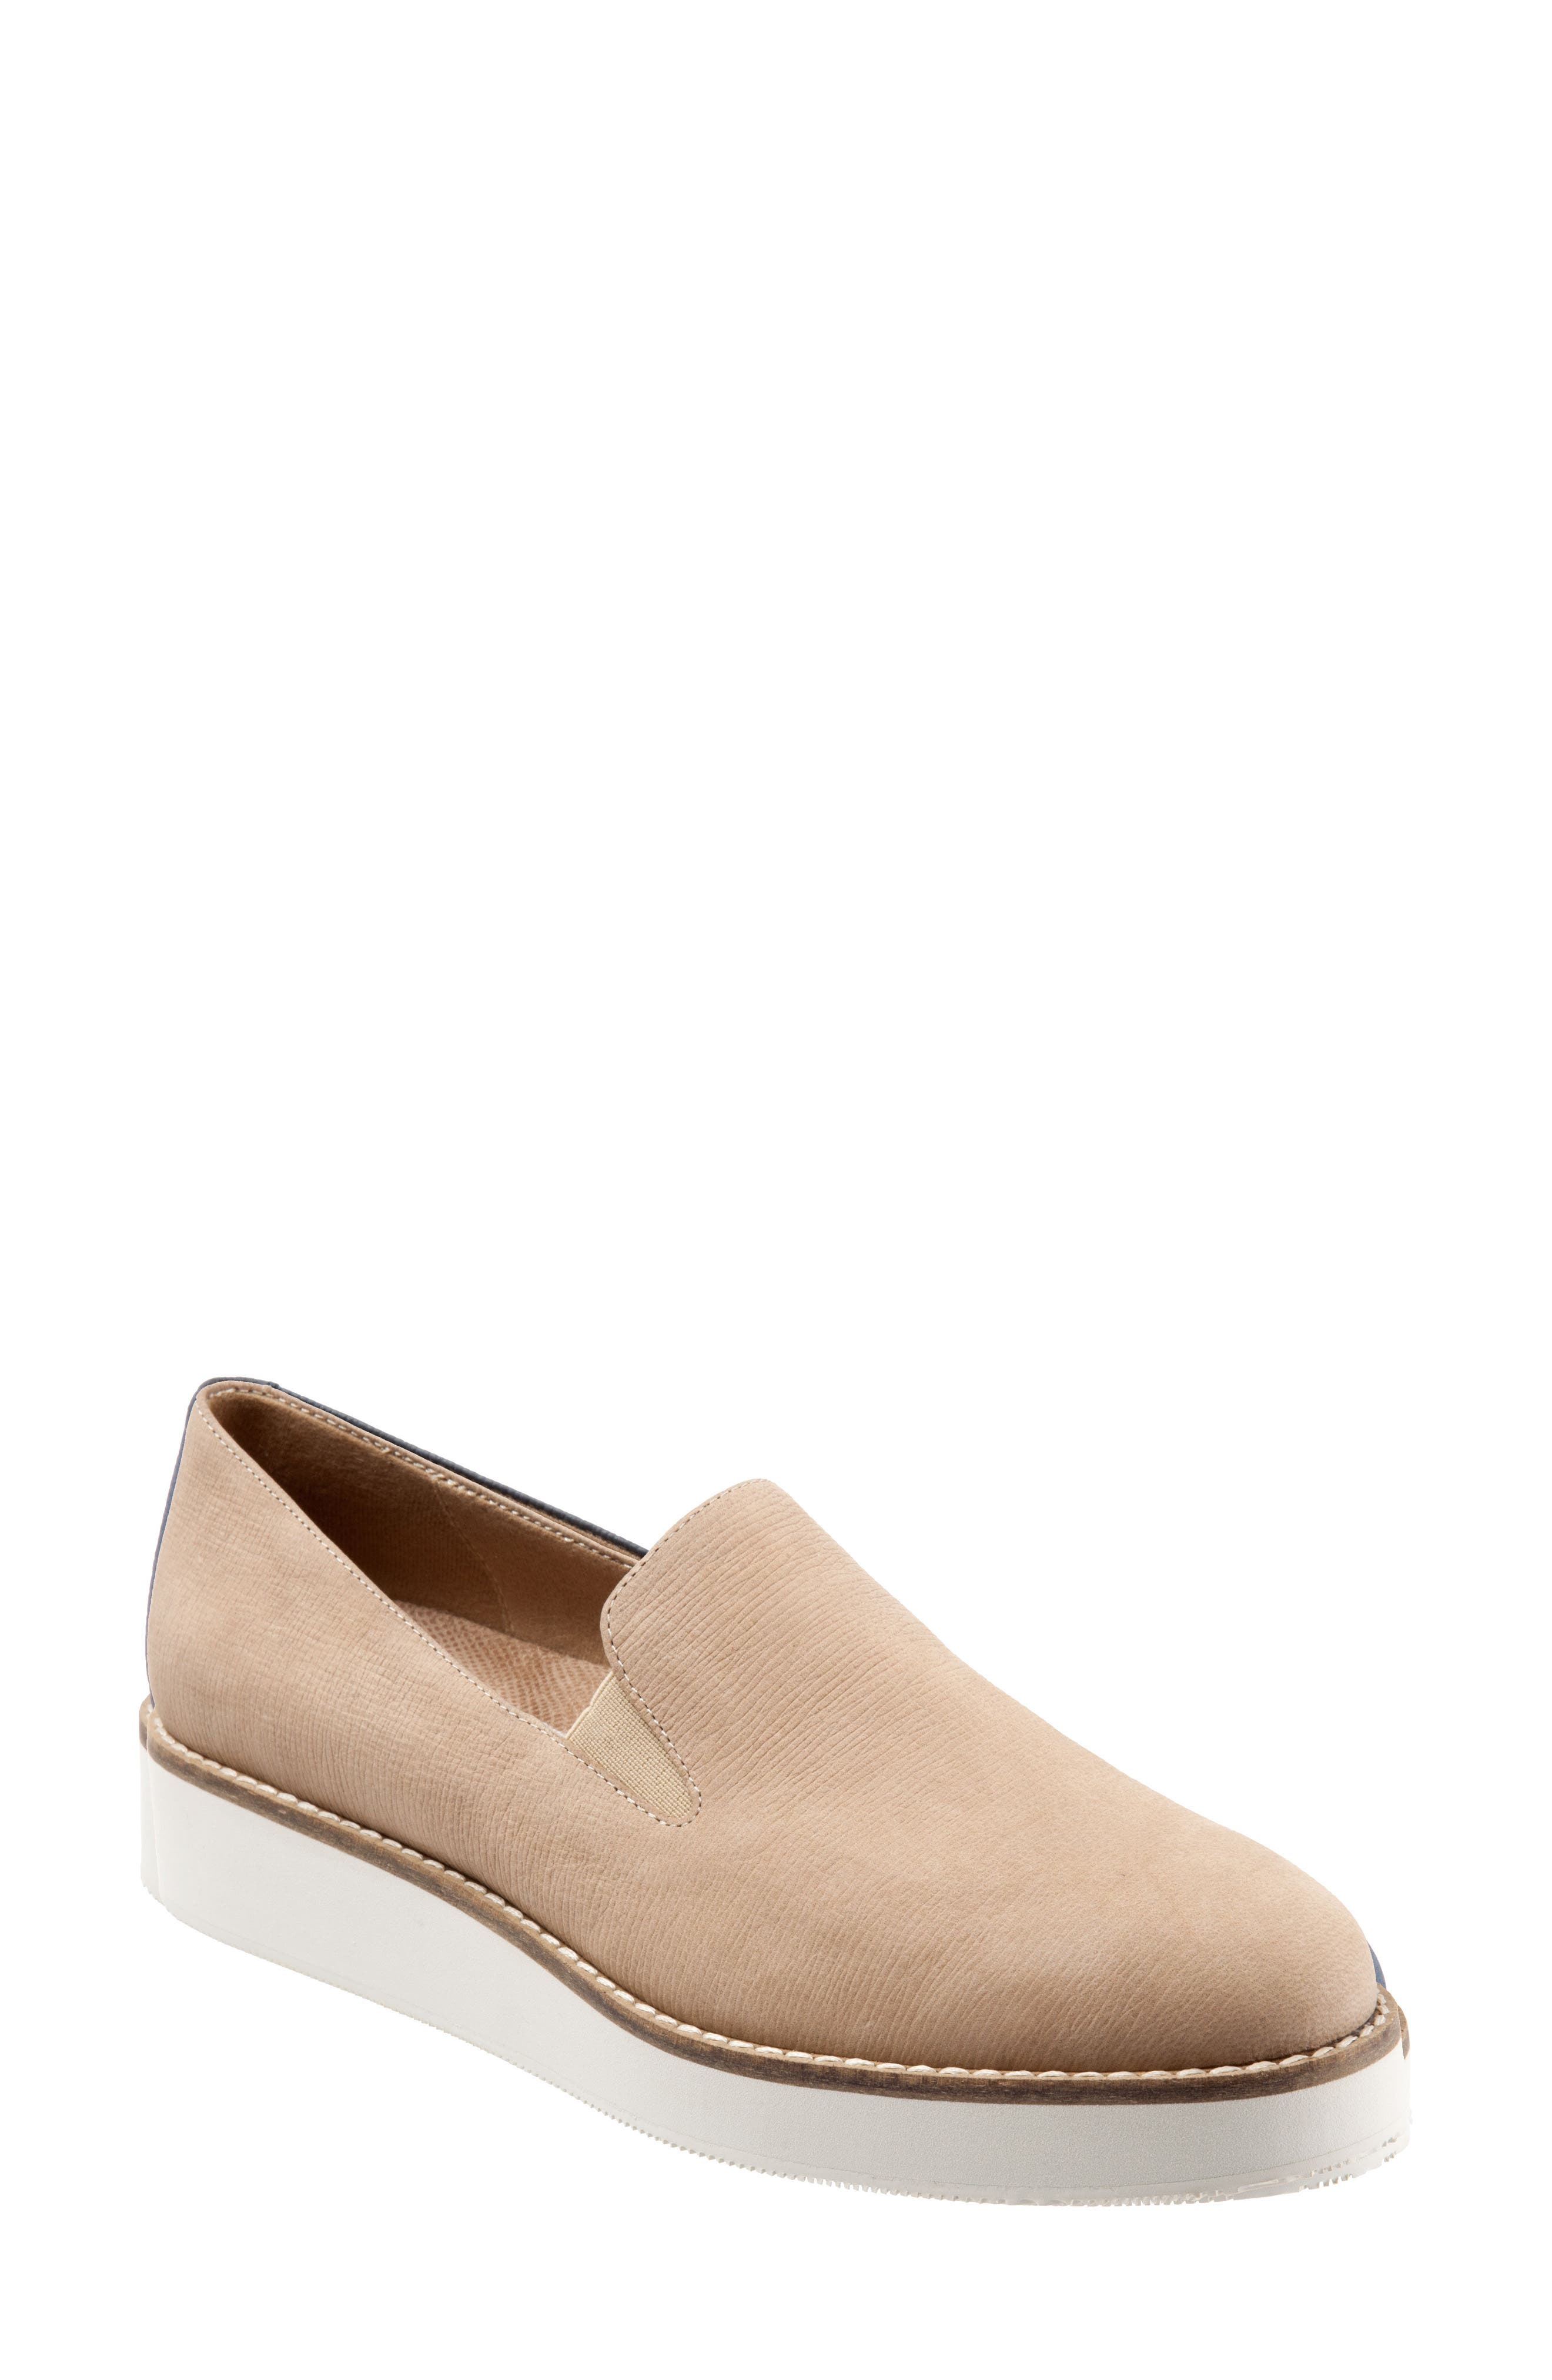 Sale Narrow Width Shoes